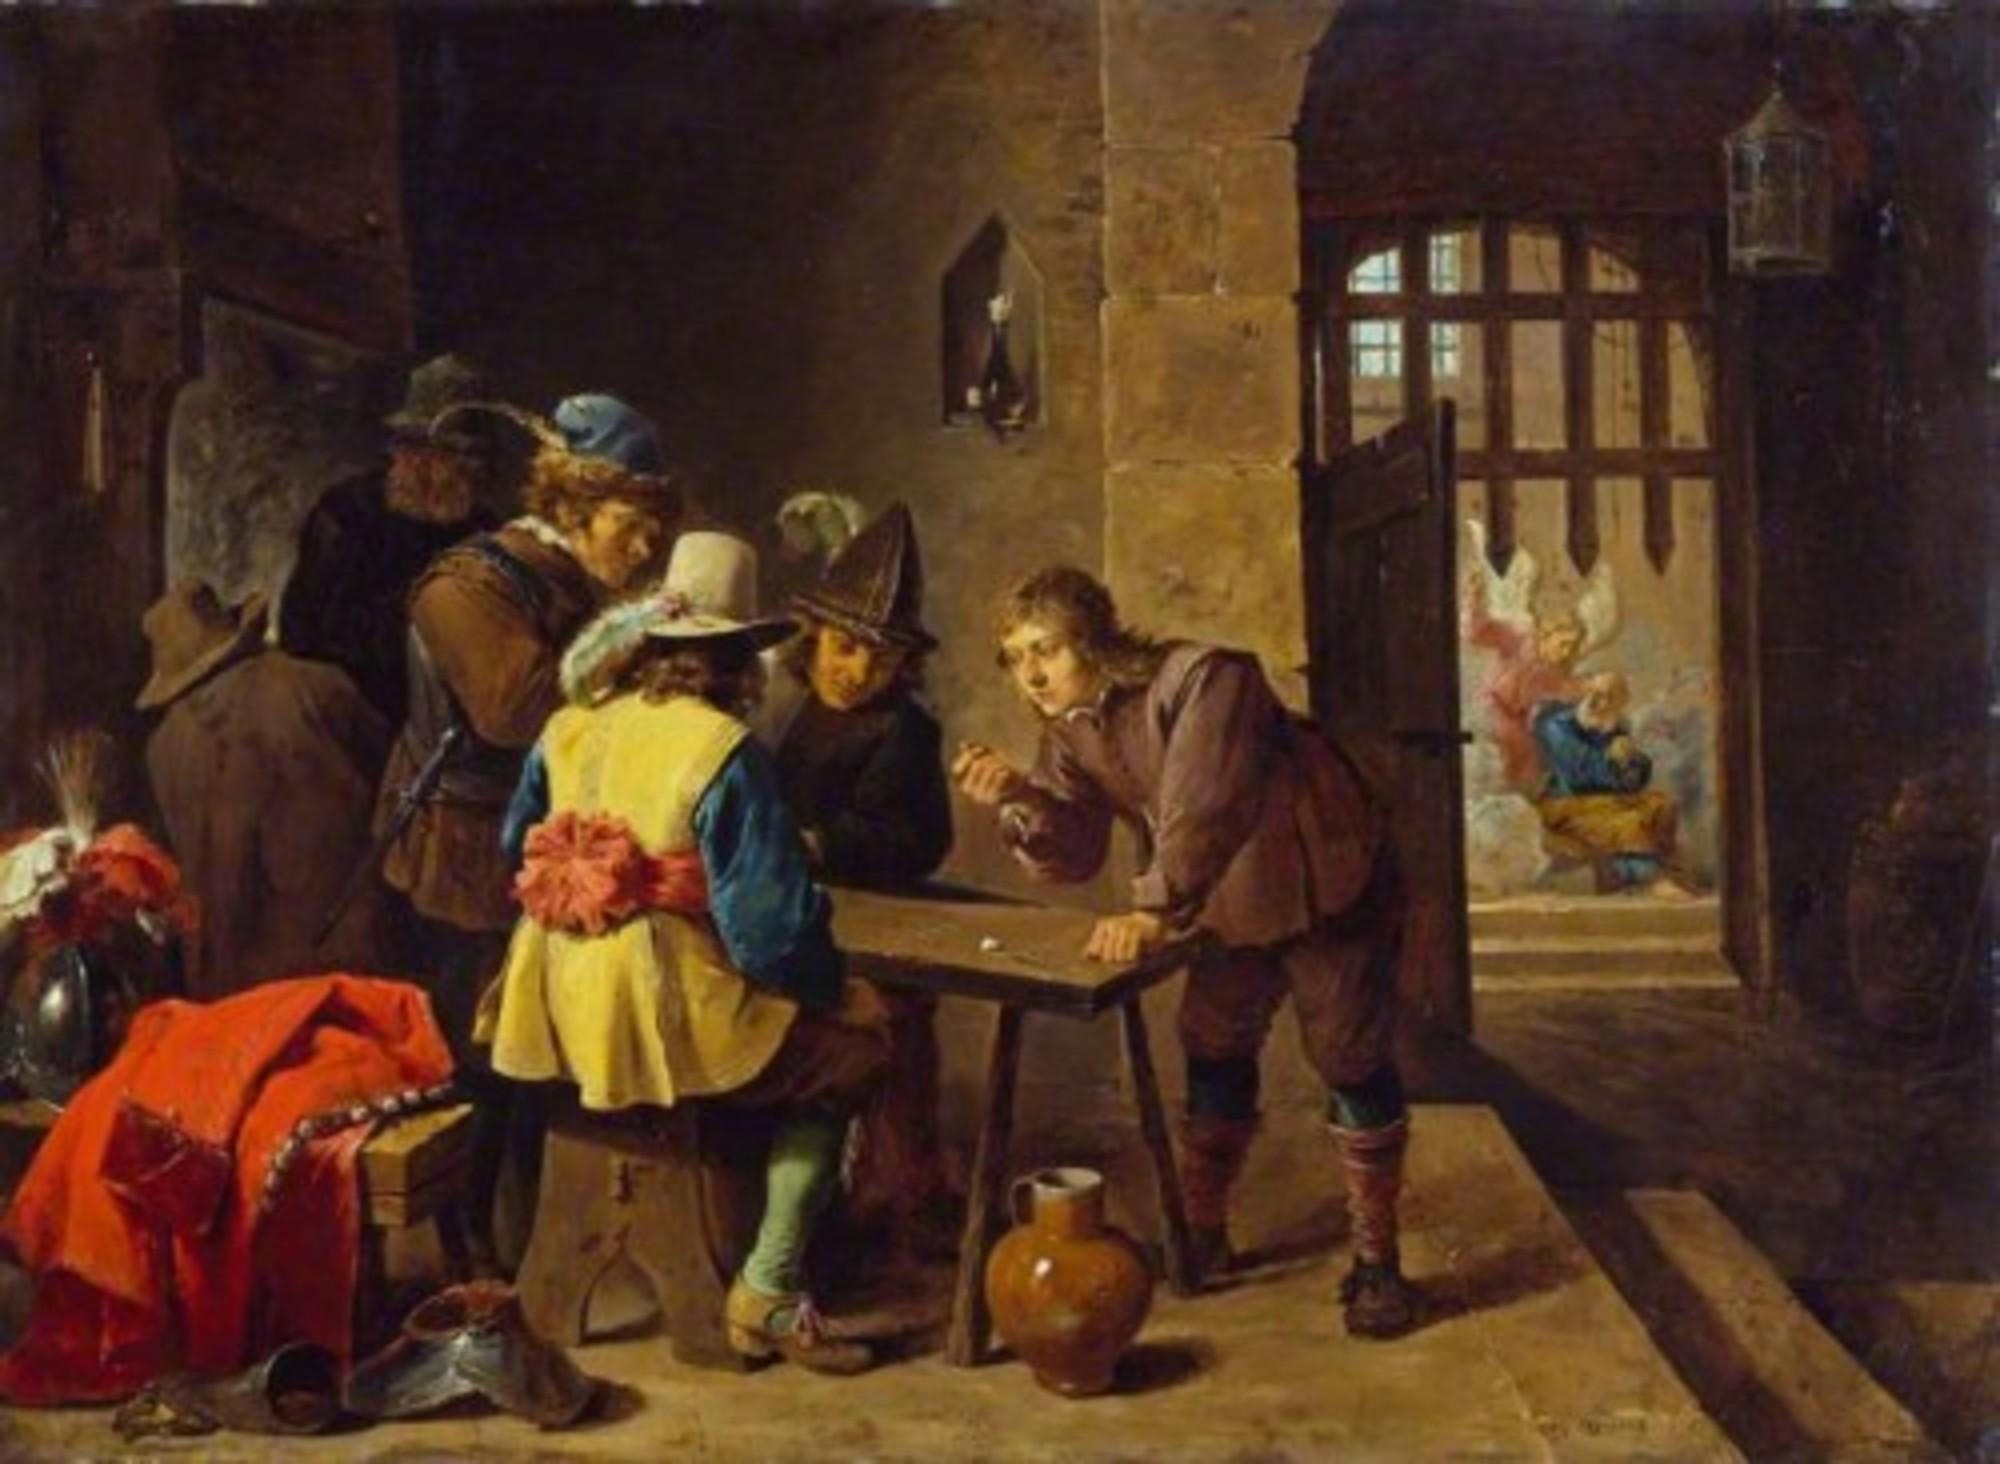 David-Teniers-II---Guardroom-scene-with-the-deliverance-of-Saint-Peter.jpg